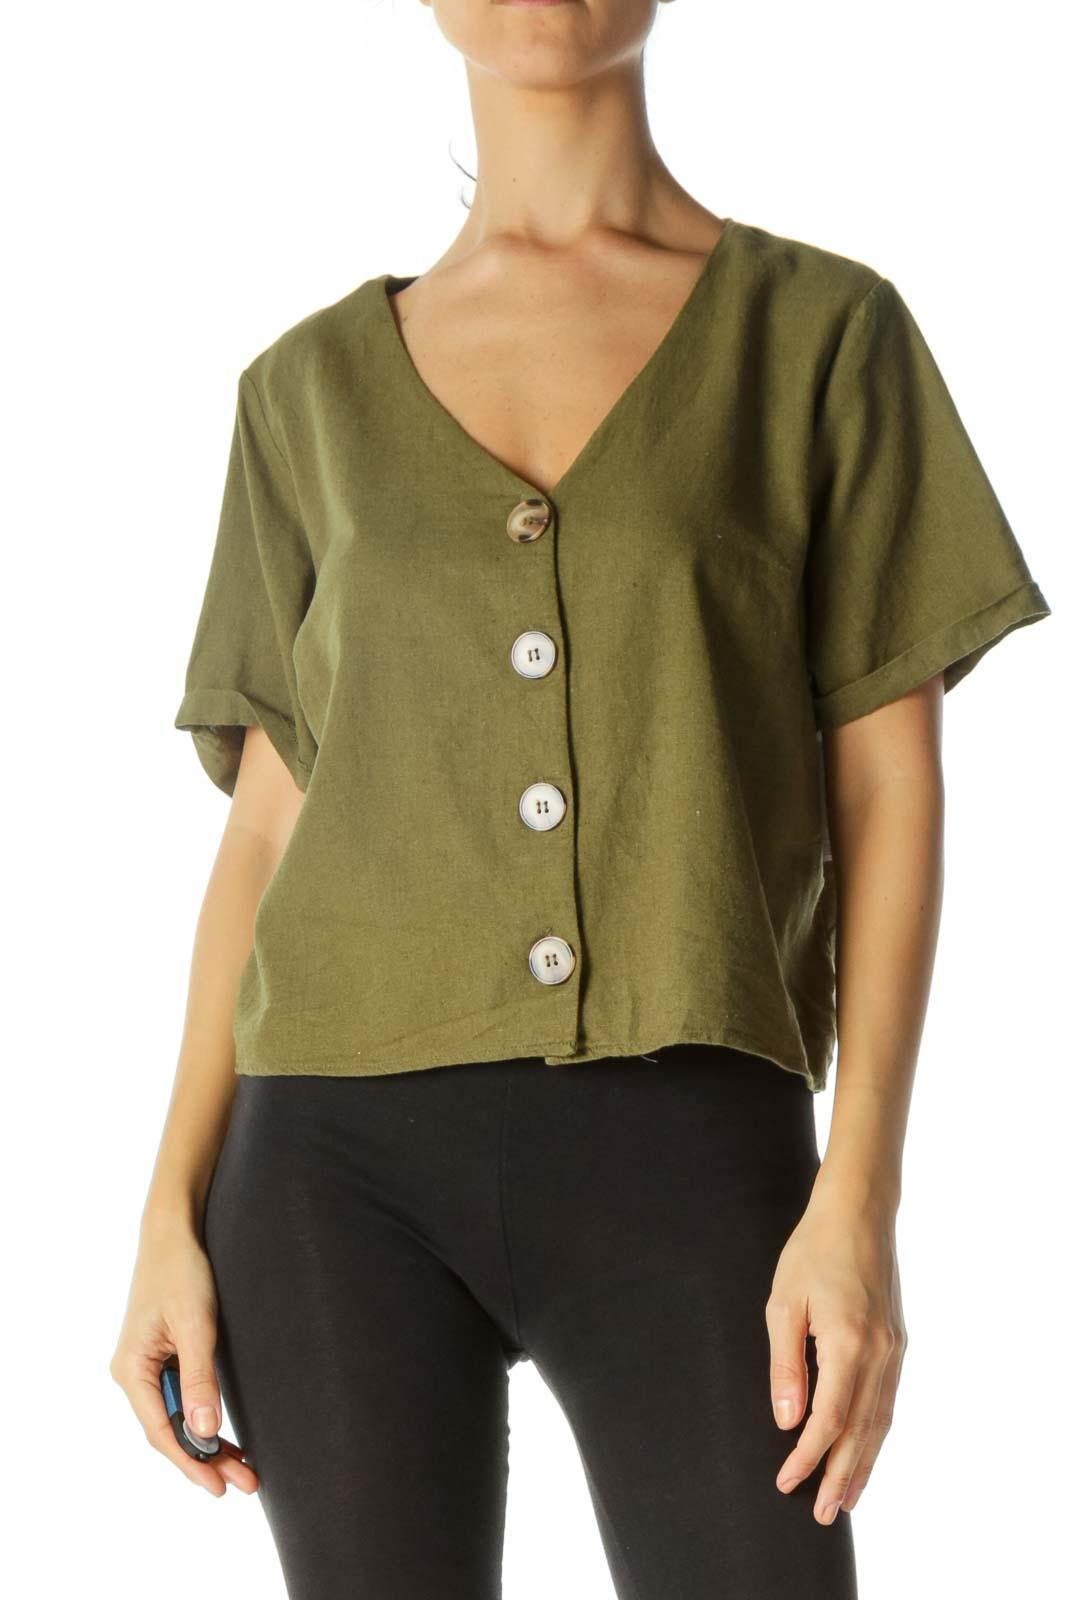 Green V-Neck Buttoned Linen Short-Sleeve Top Front